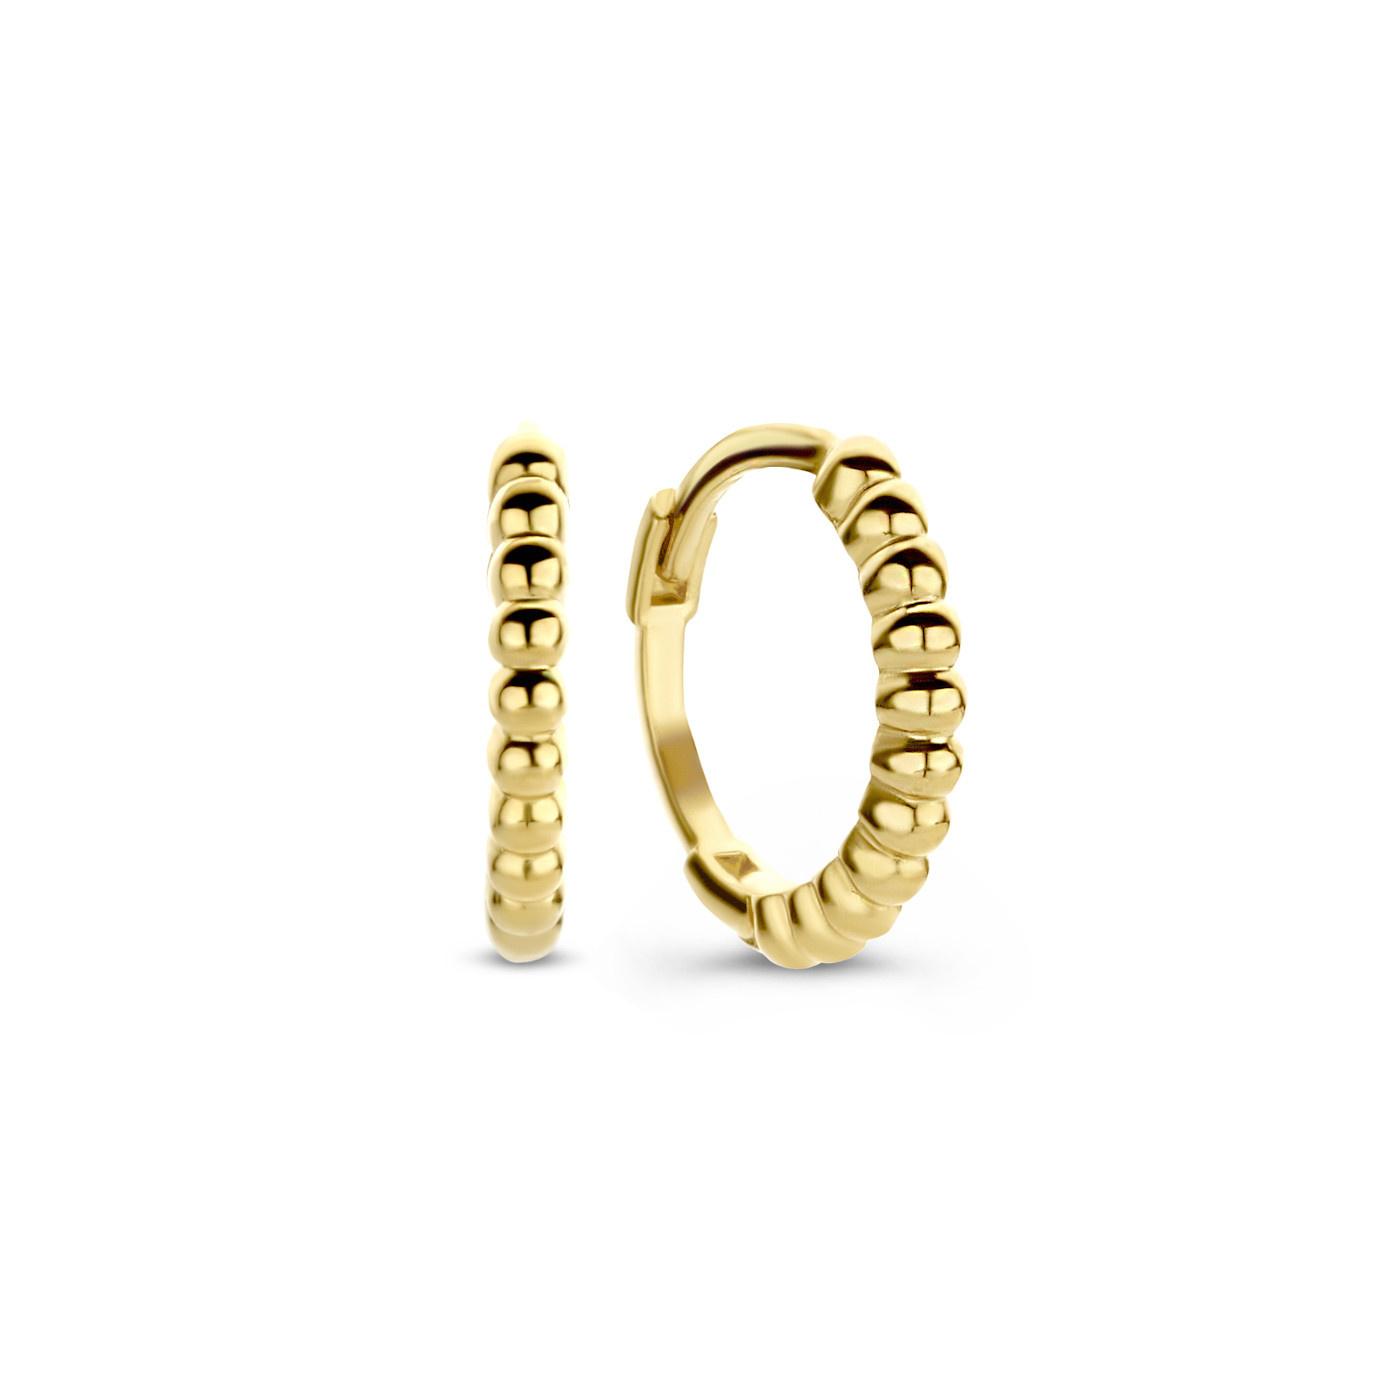 Isabel Bernard Le Marais Anne-Aurelia 14 karat gold hoop earrings twist